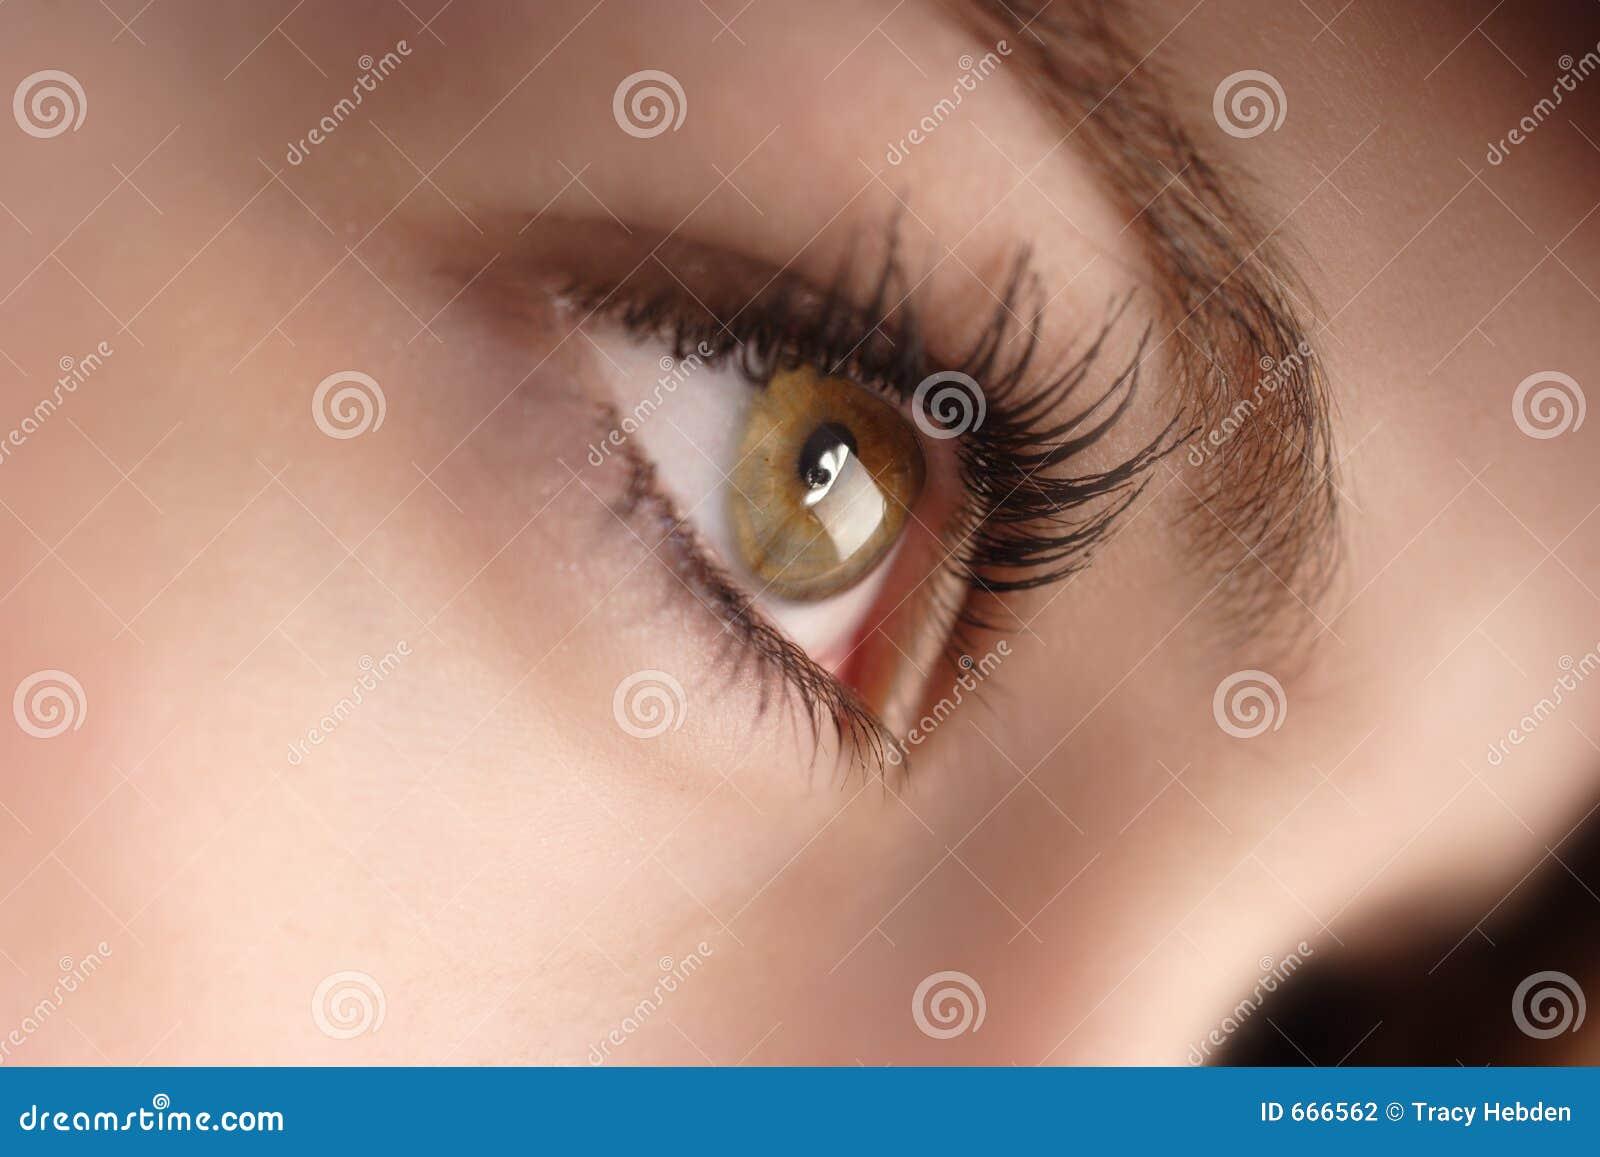 hazel eyes stock photography